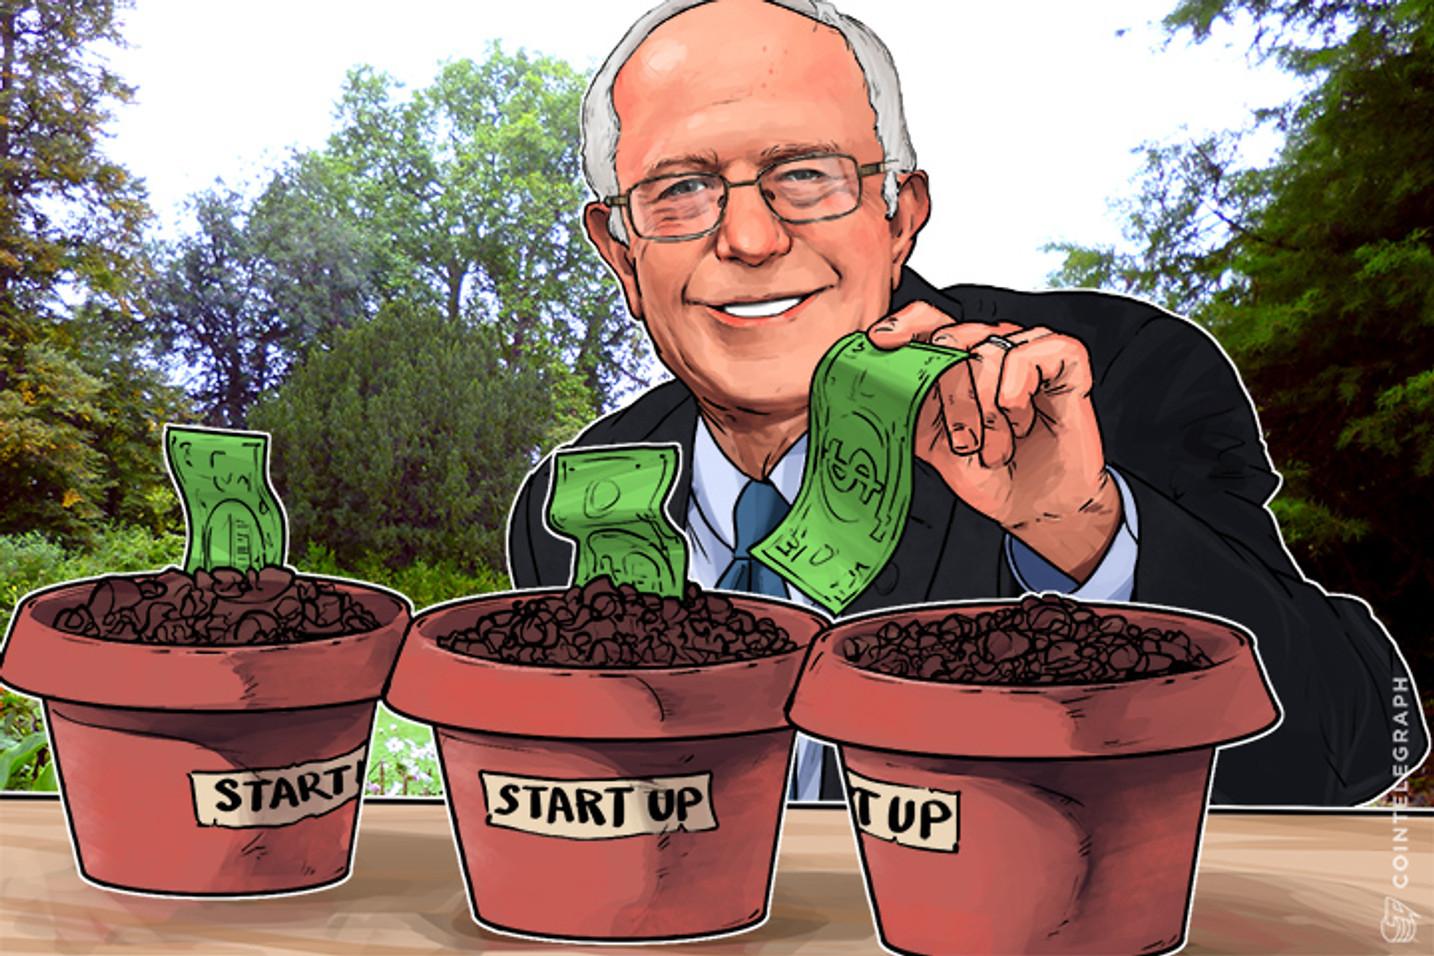 What if Bernie Sanders Had Raised Money for Blockchain Startups Instead